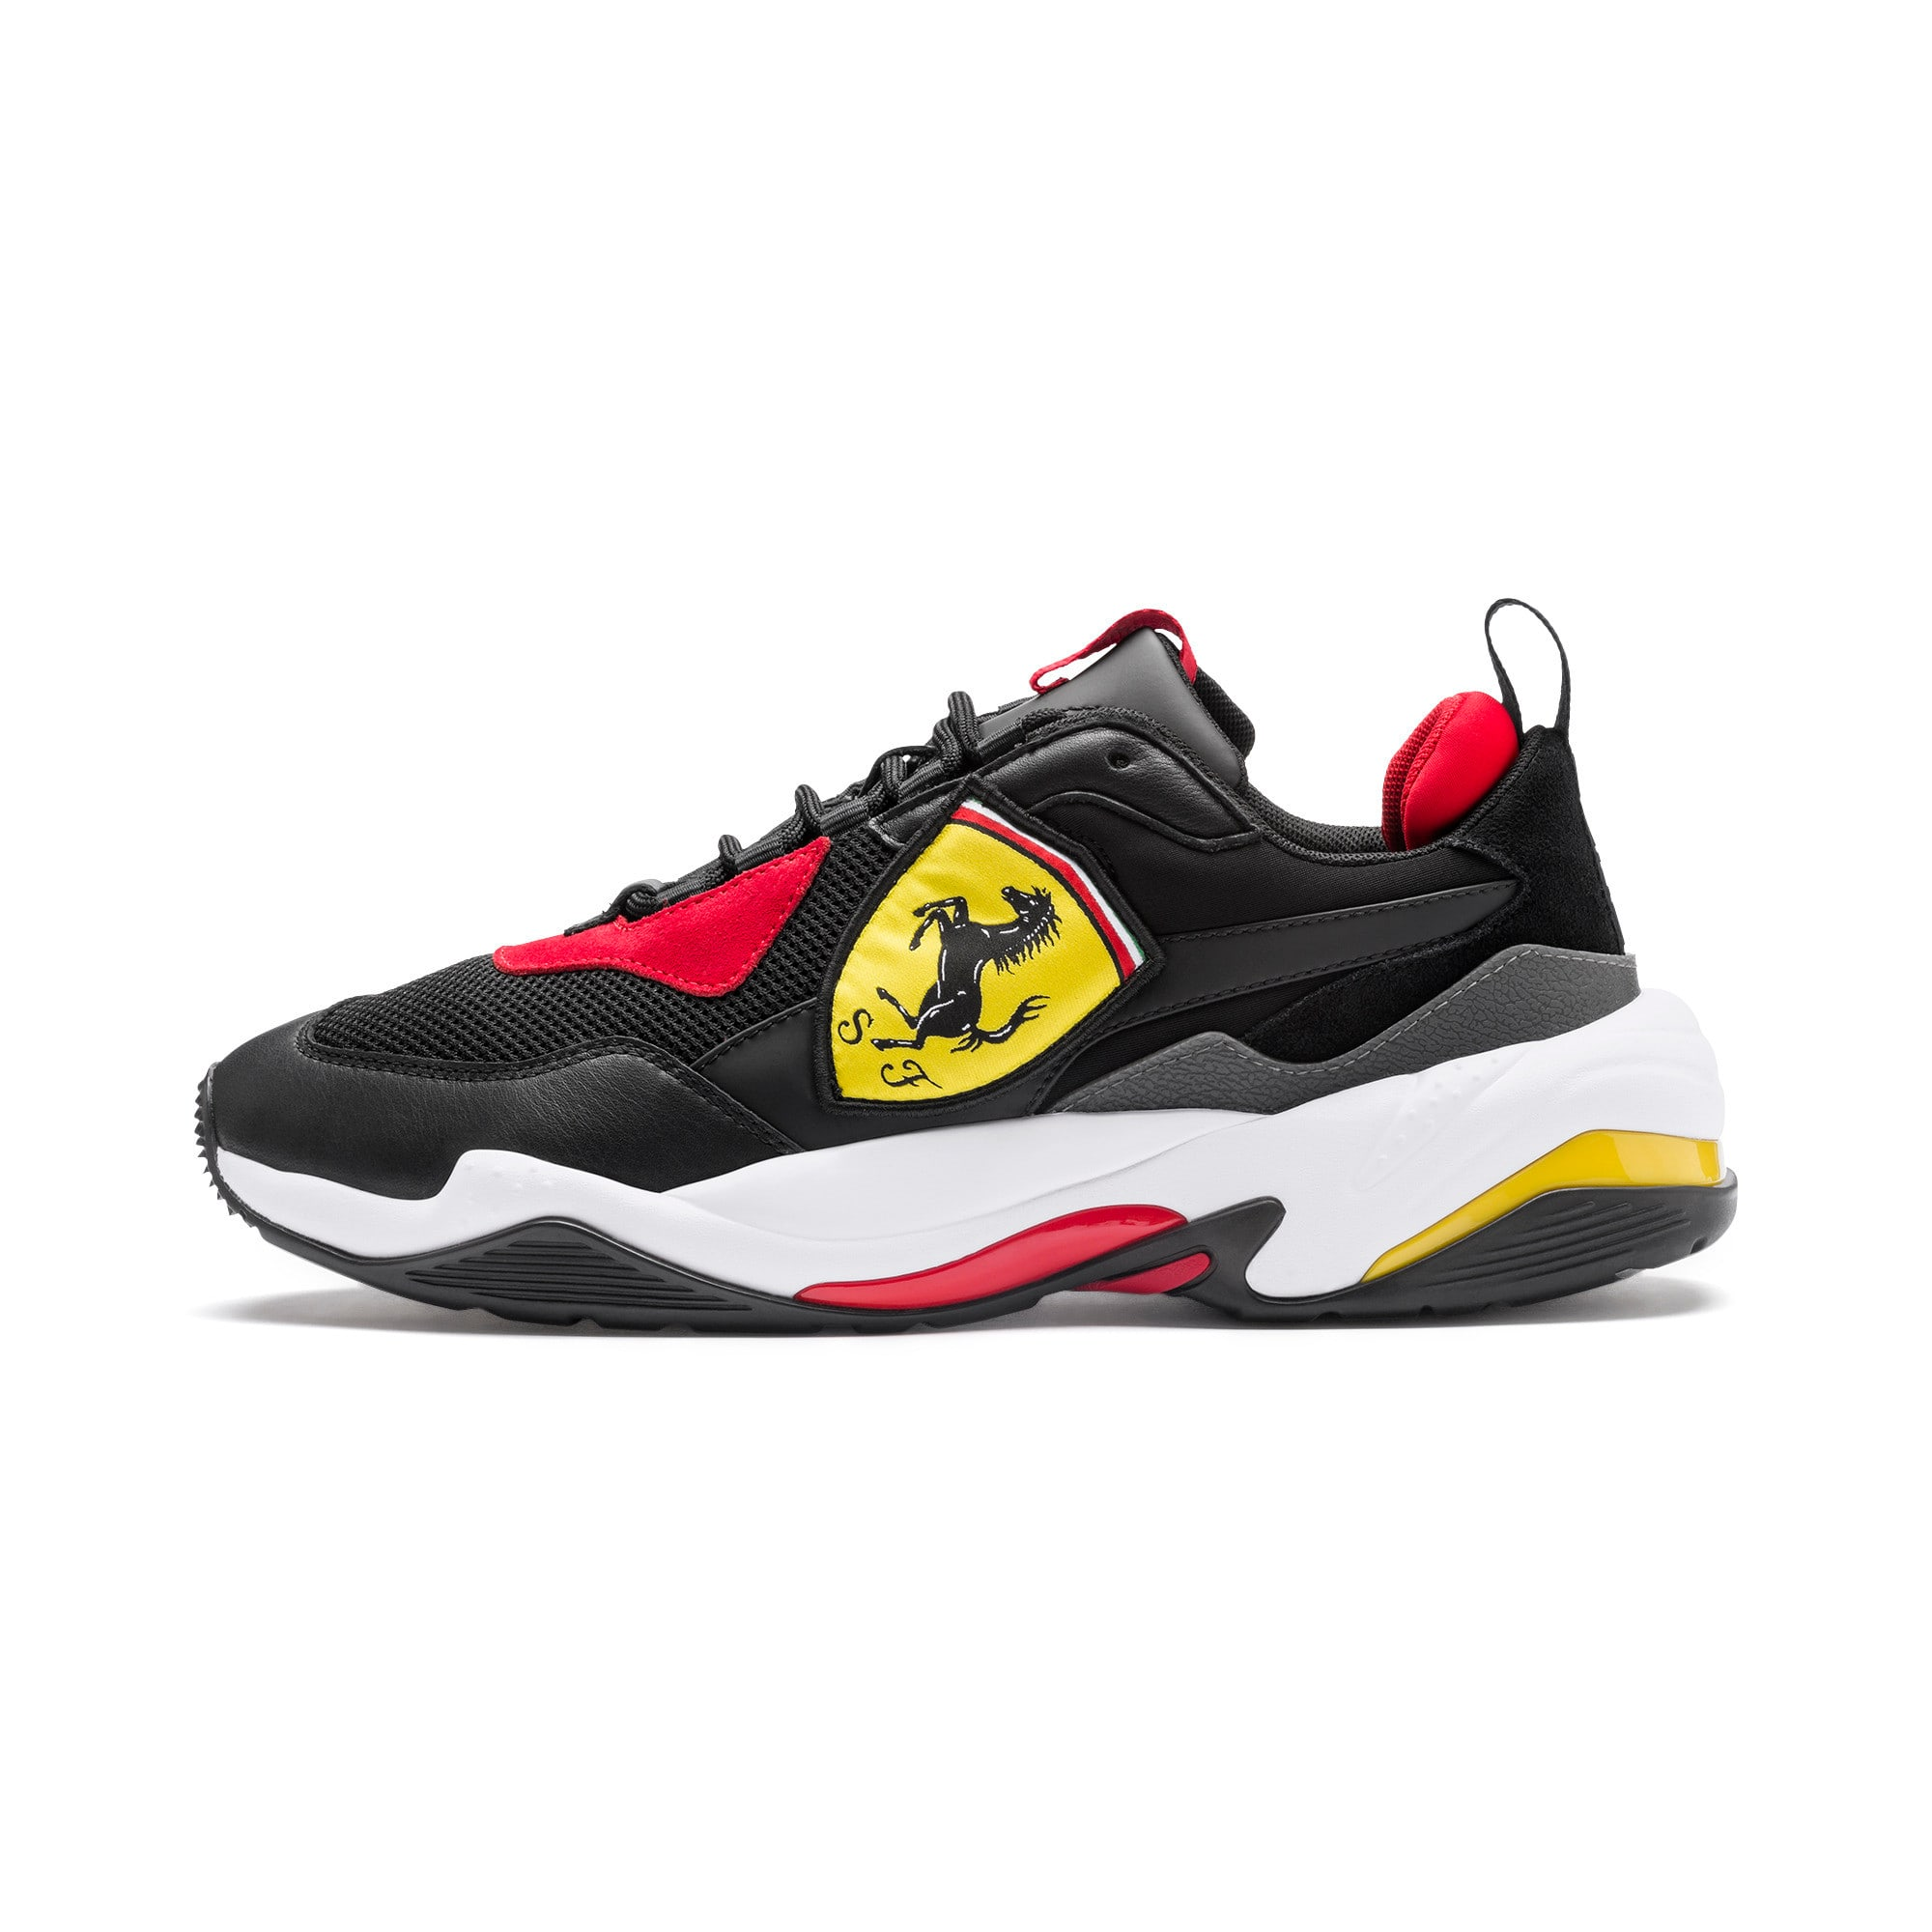 Thumbnail 1 of Ferrari Thunder Trainers, Puma Black-Rosso Corsa, medium